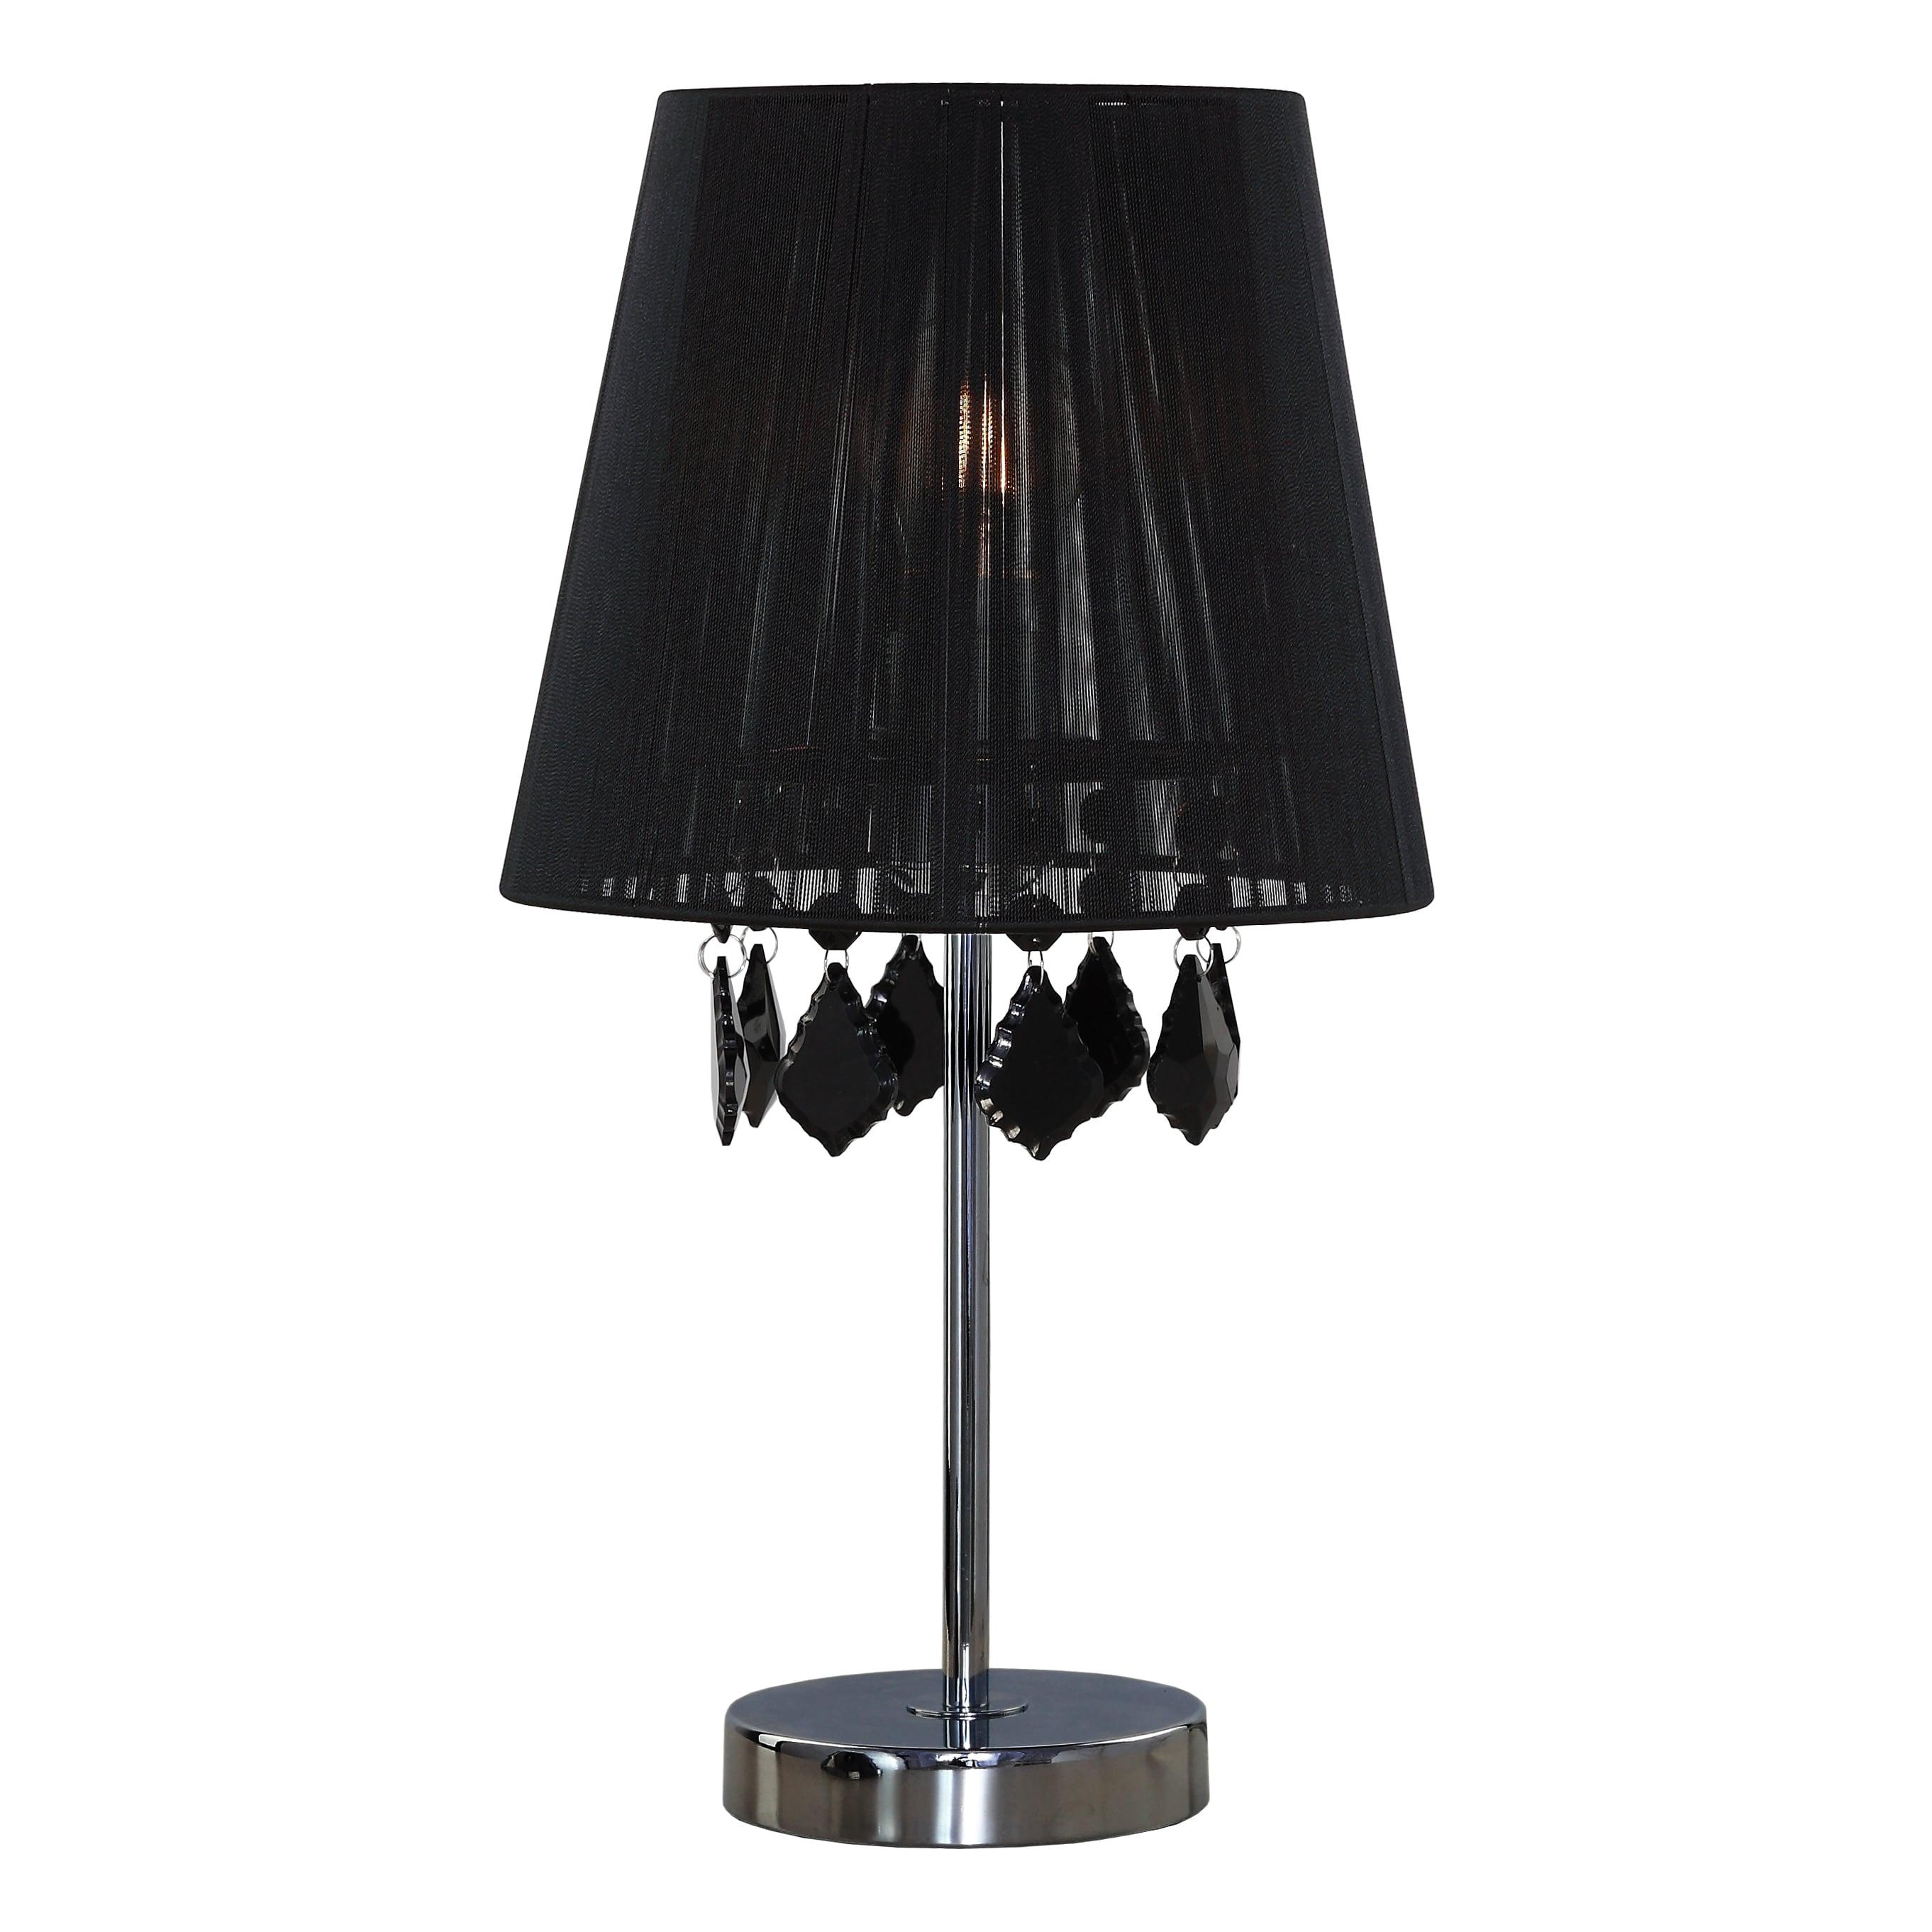 Desk lamp Black small Glamor with diamonds